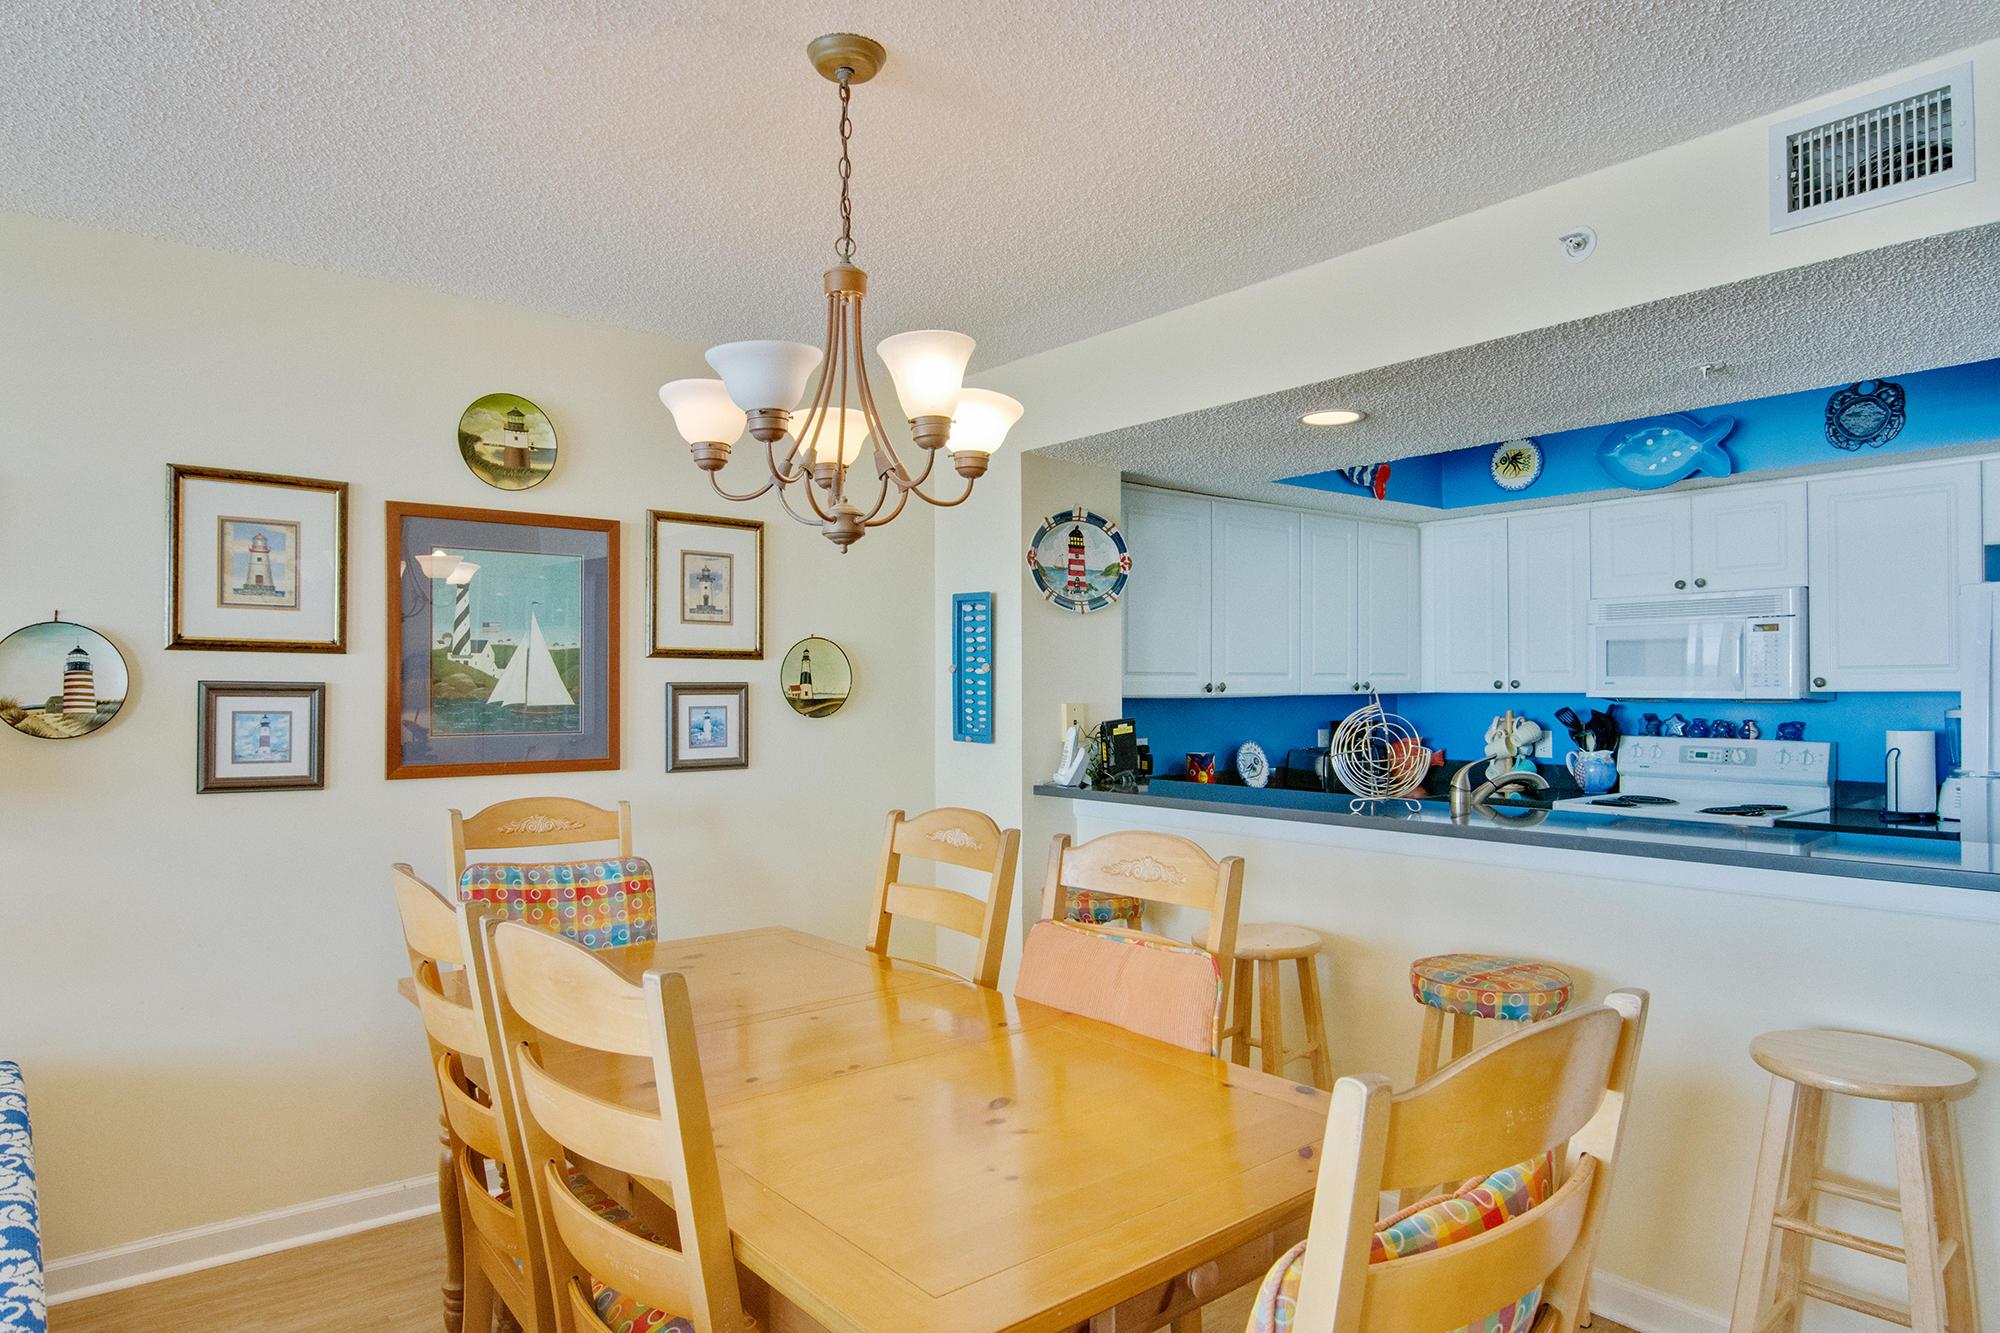 Charleston Oceanfront Villas Homes For Sale - 201 Arctic, Folly Beach, SC - 0